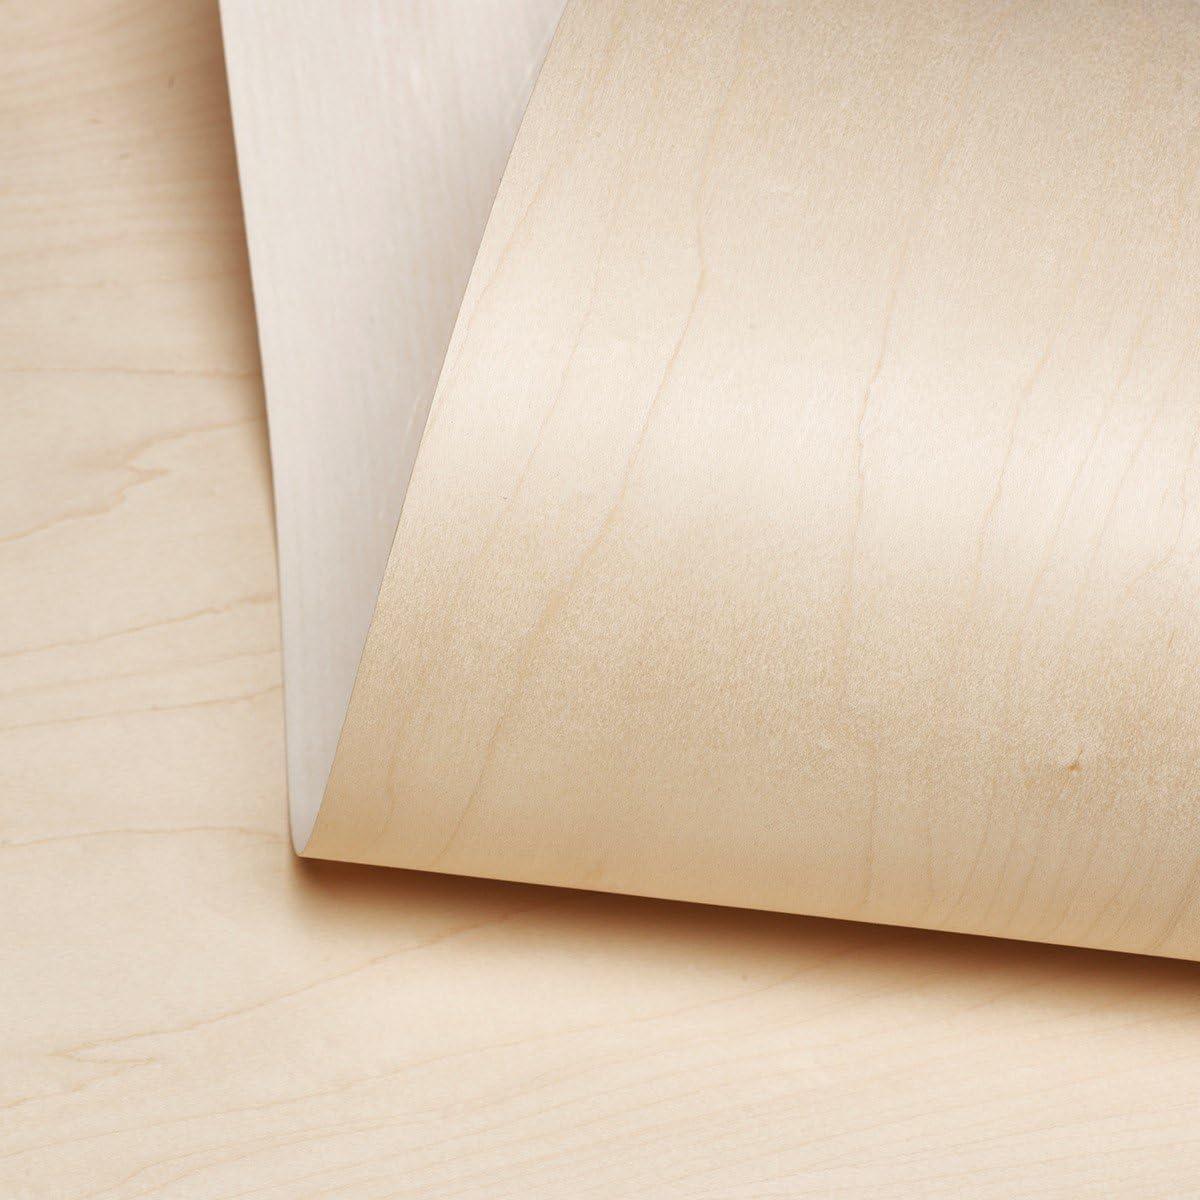 "Edge Supply Maple Wood Veneer Sheet Flat Cut, 24"" x 96"", Peel and Stick, ""A"" Grade Veneer Face – Easy Application with 3M Self Adhesive Maple Veneer Sheet– Veneer Sheets for Restoration of Furniture"